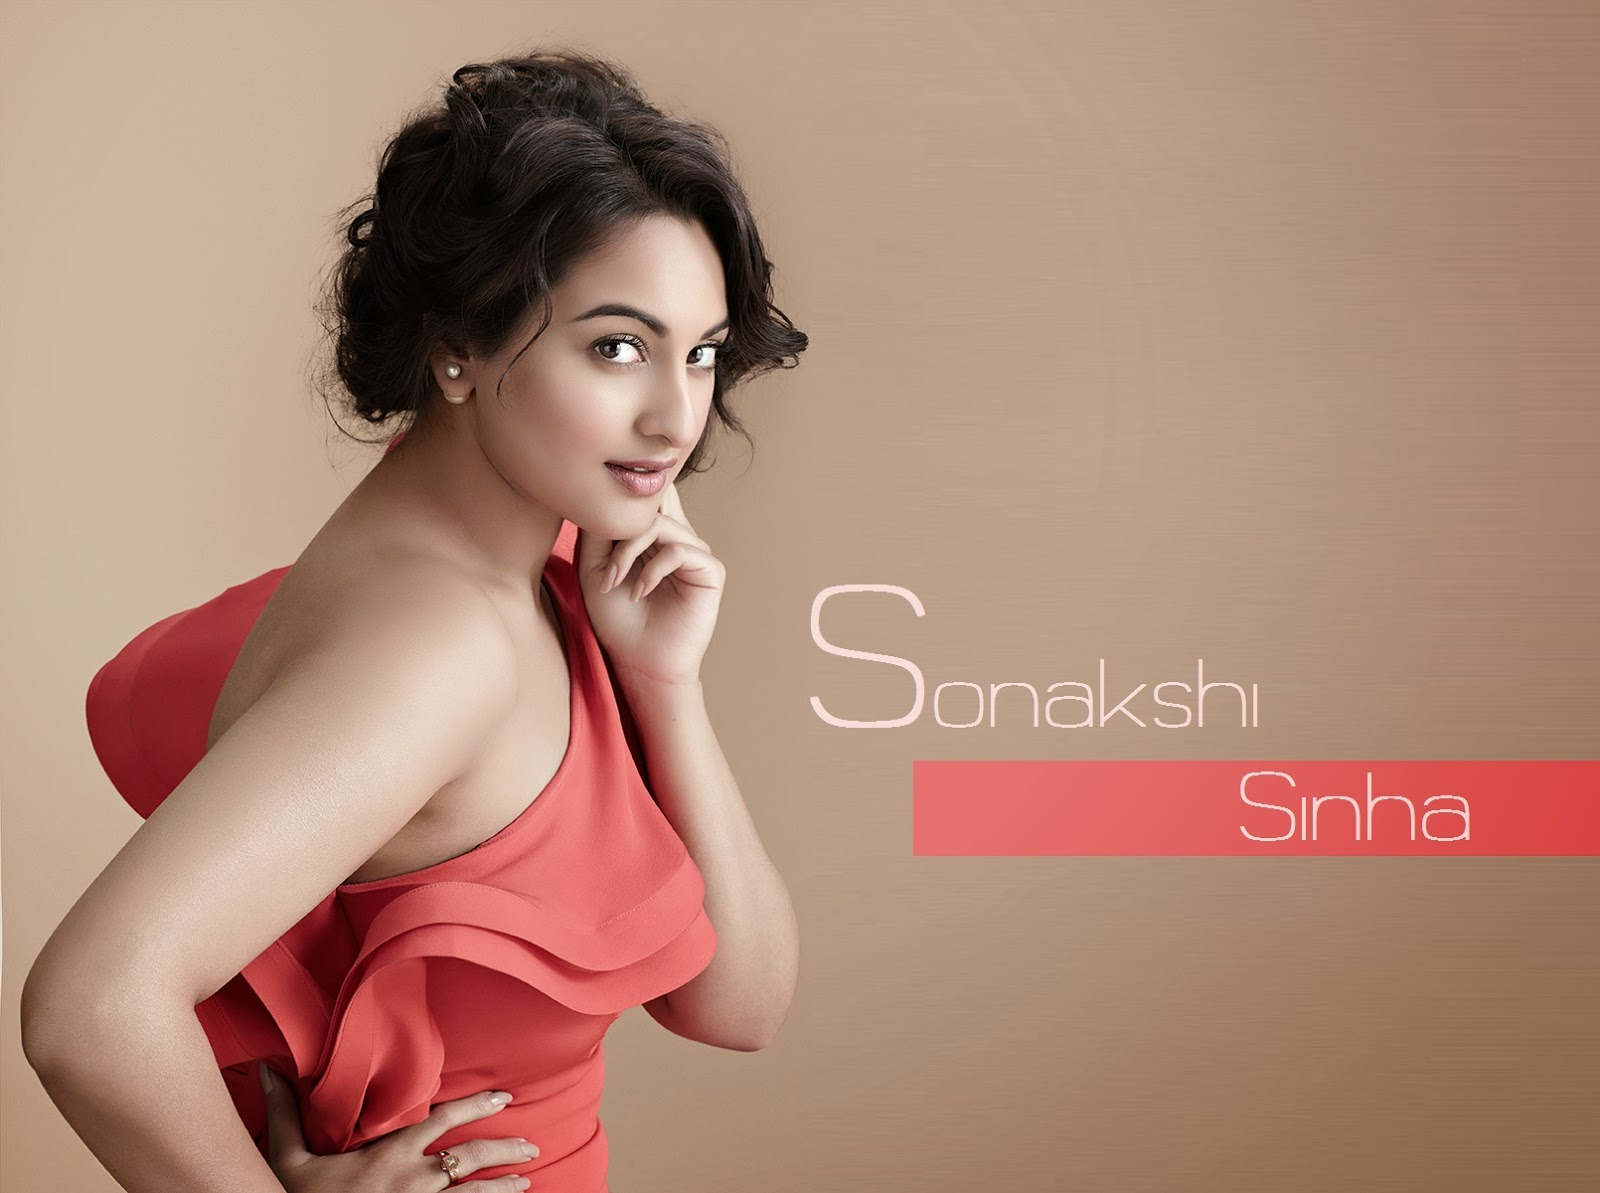 Sonakshi Sinha Hd Wallpapers 25 36 Popopicscom